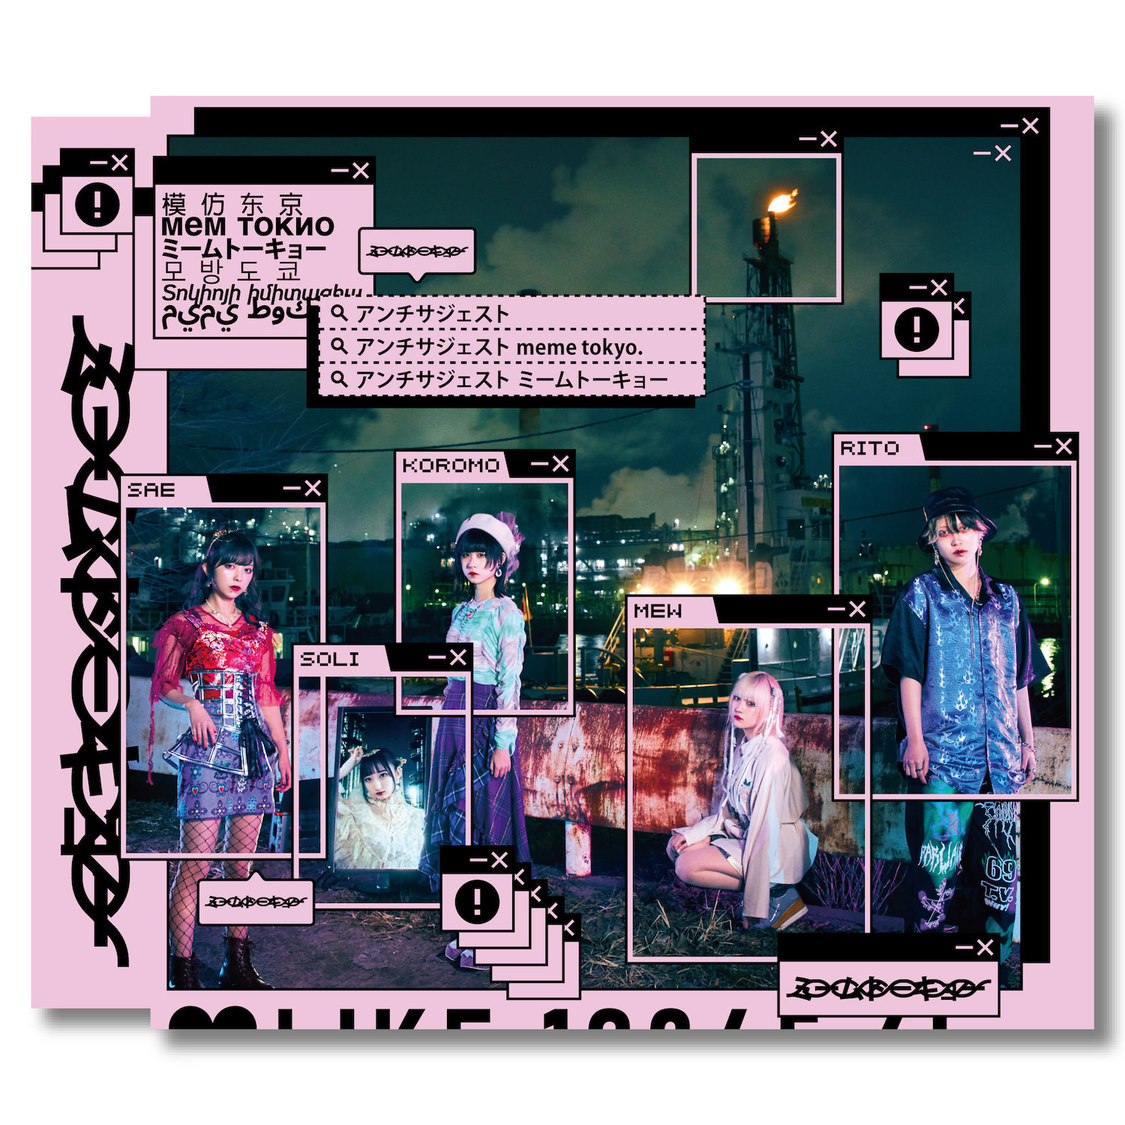 meme tokyo.、新曲「アンチサジェスト」CDリリース&MV公開決定! 結成2周年当日にはワンマン開催も